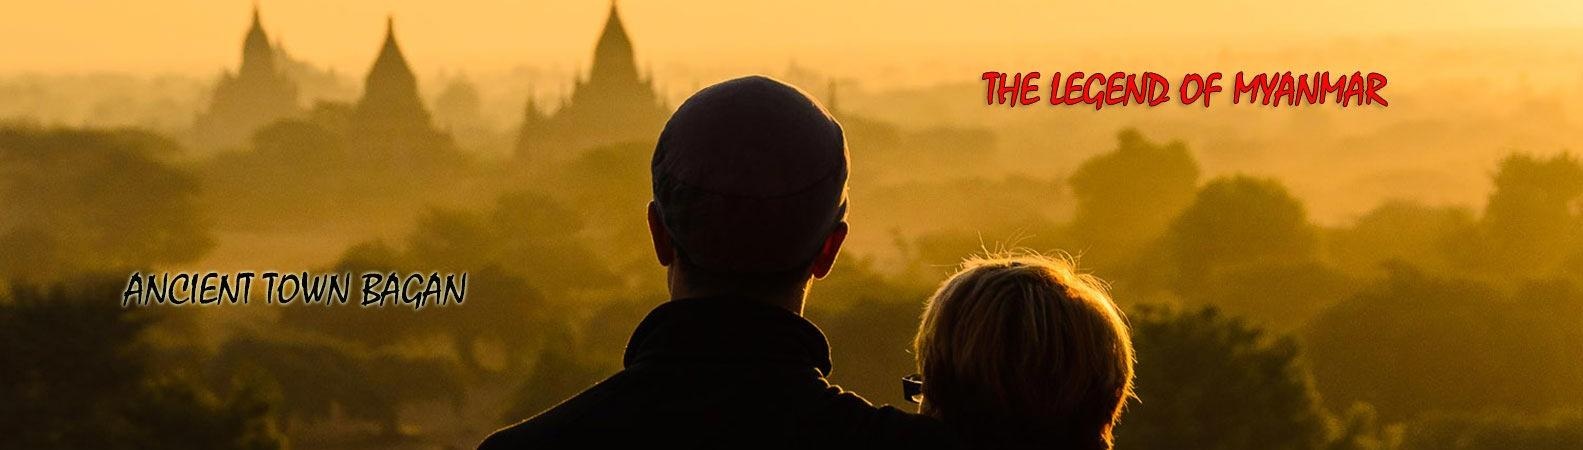 bookingtours Vietnam - Thailand Happy Honeymoon 18 days